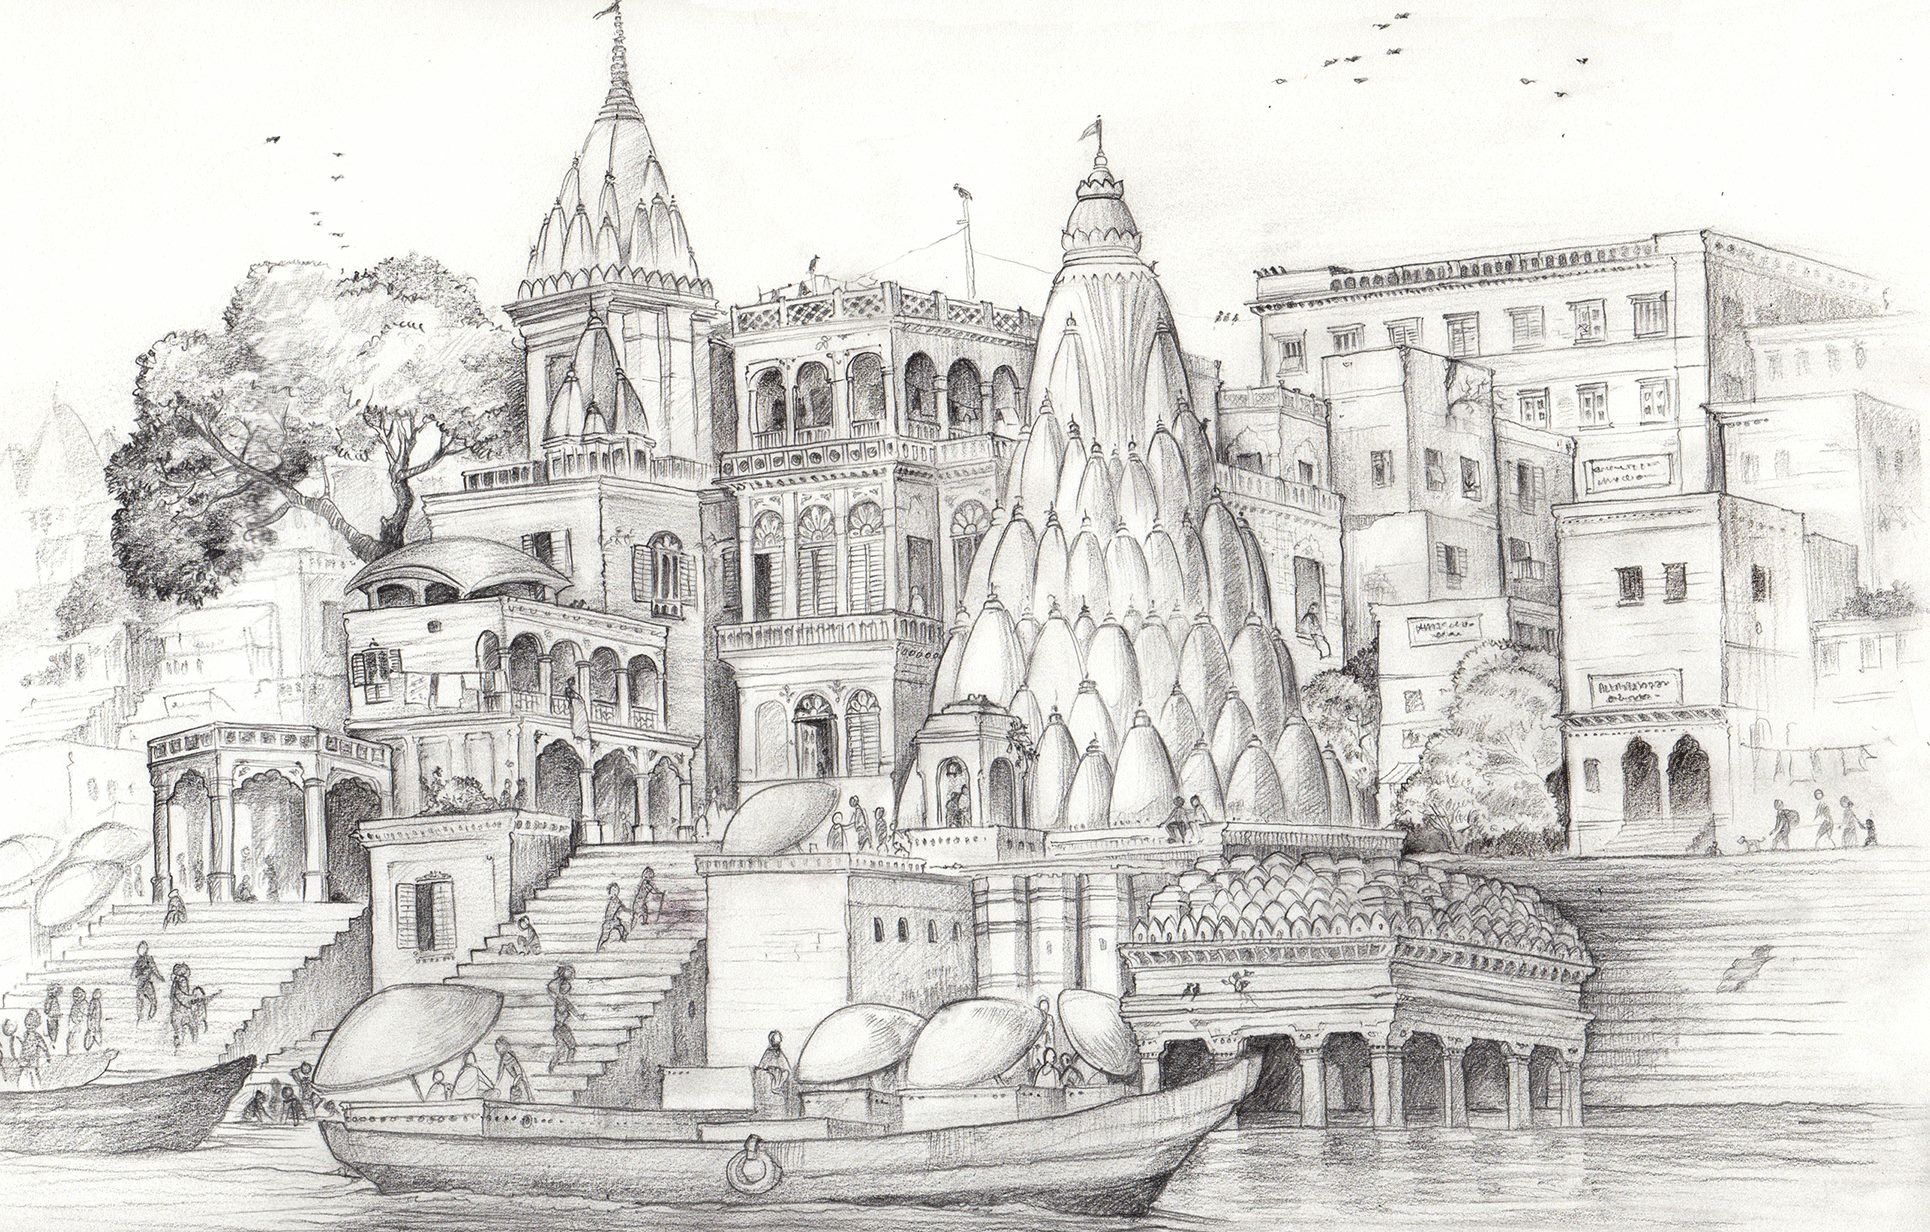 Varanasi ghaats banks of the ganges a pencil sketch